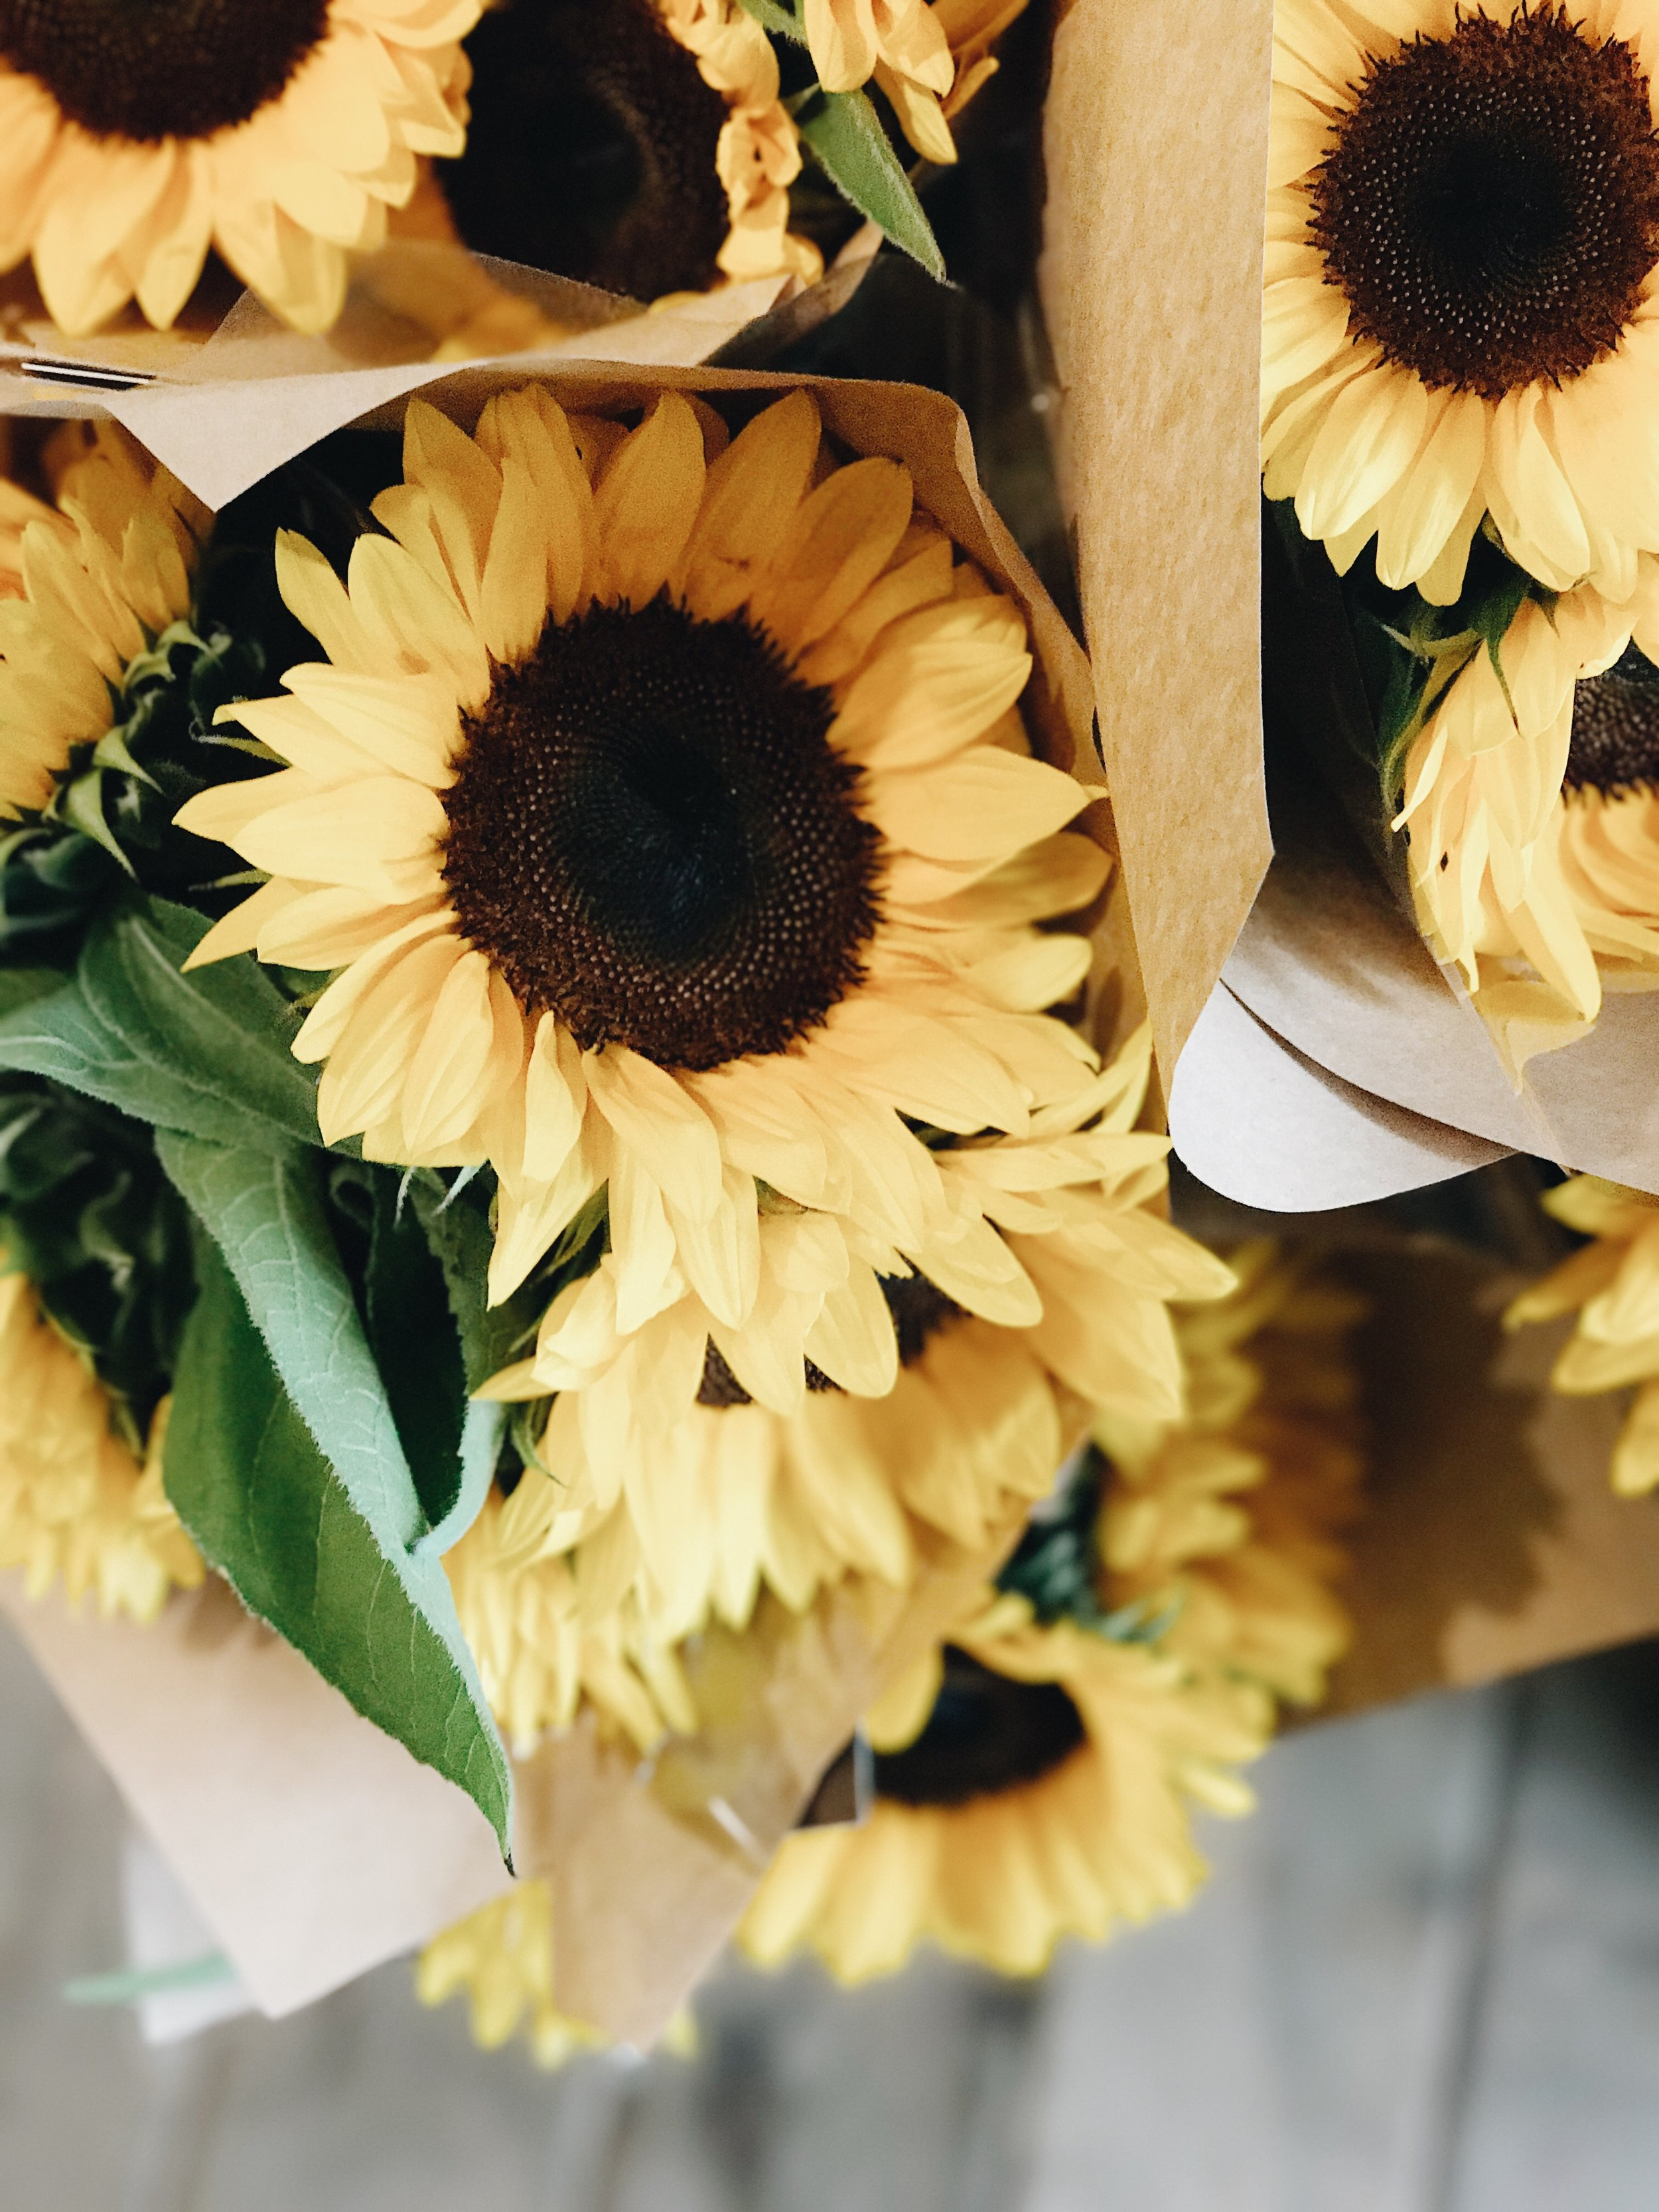 Fall Flowers 101, Yellow Sunflowers, Nyla Free Designs Inc.